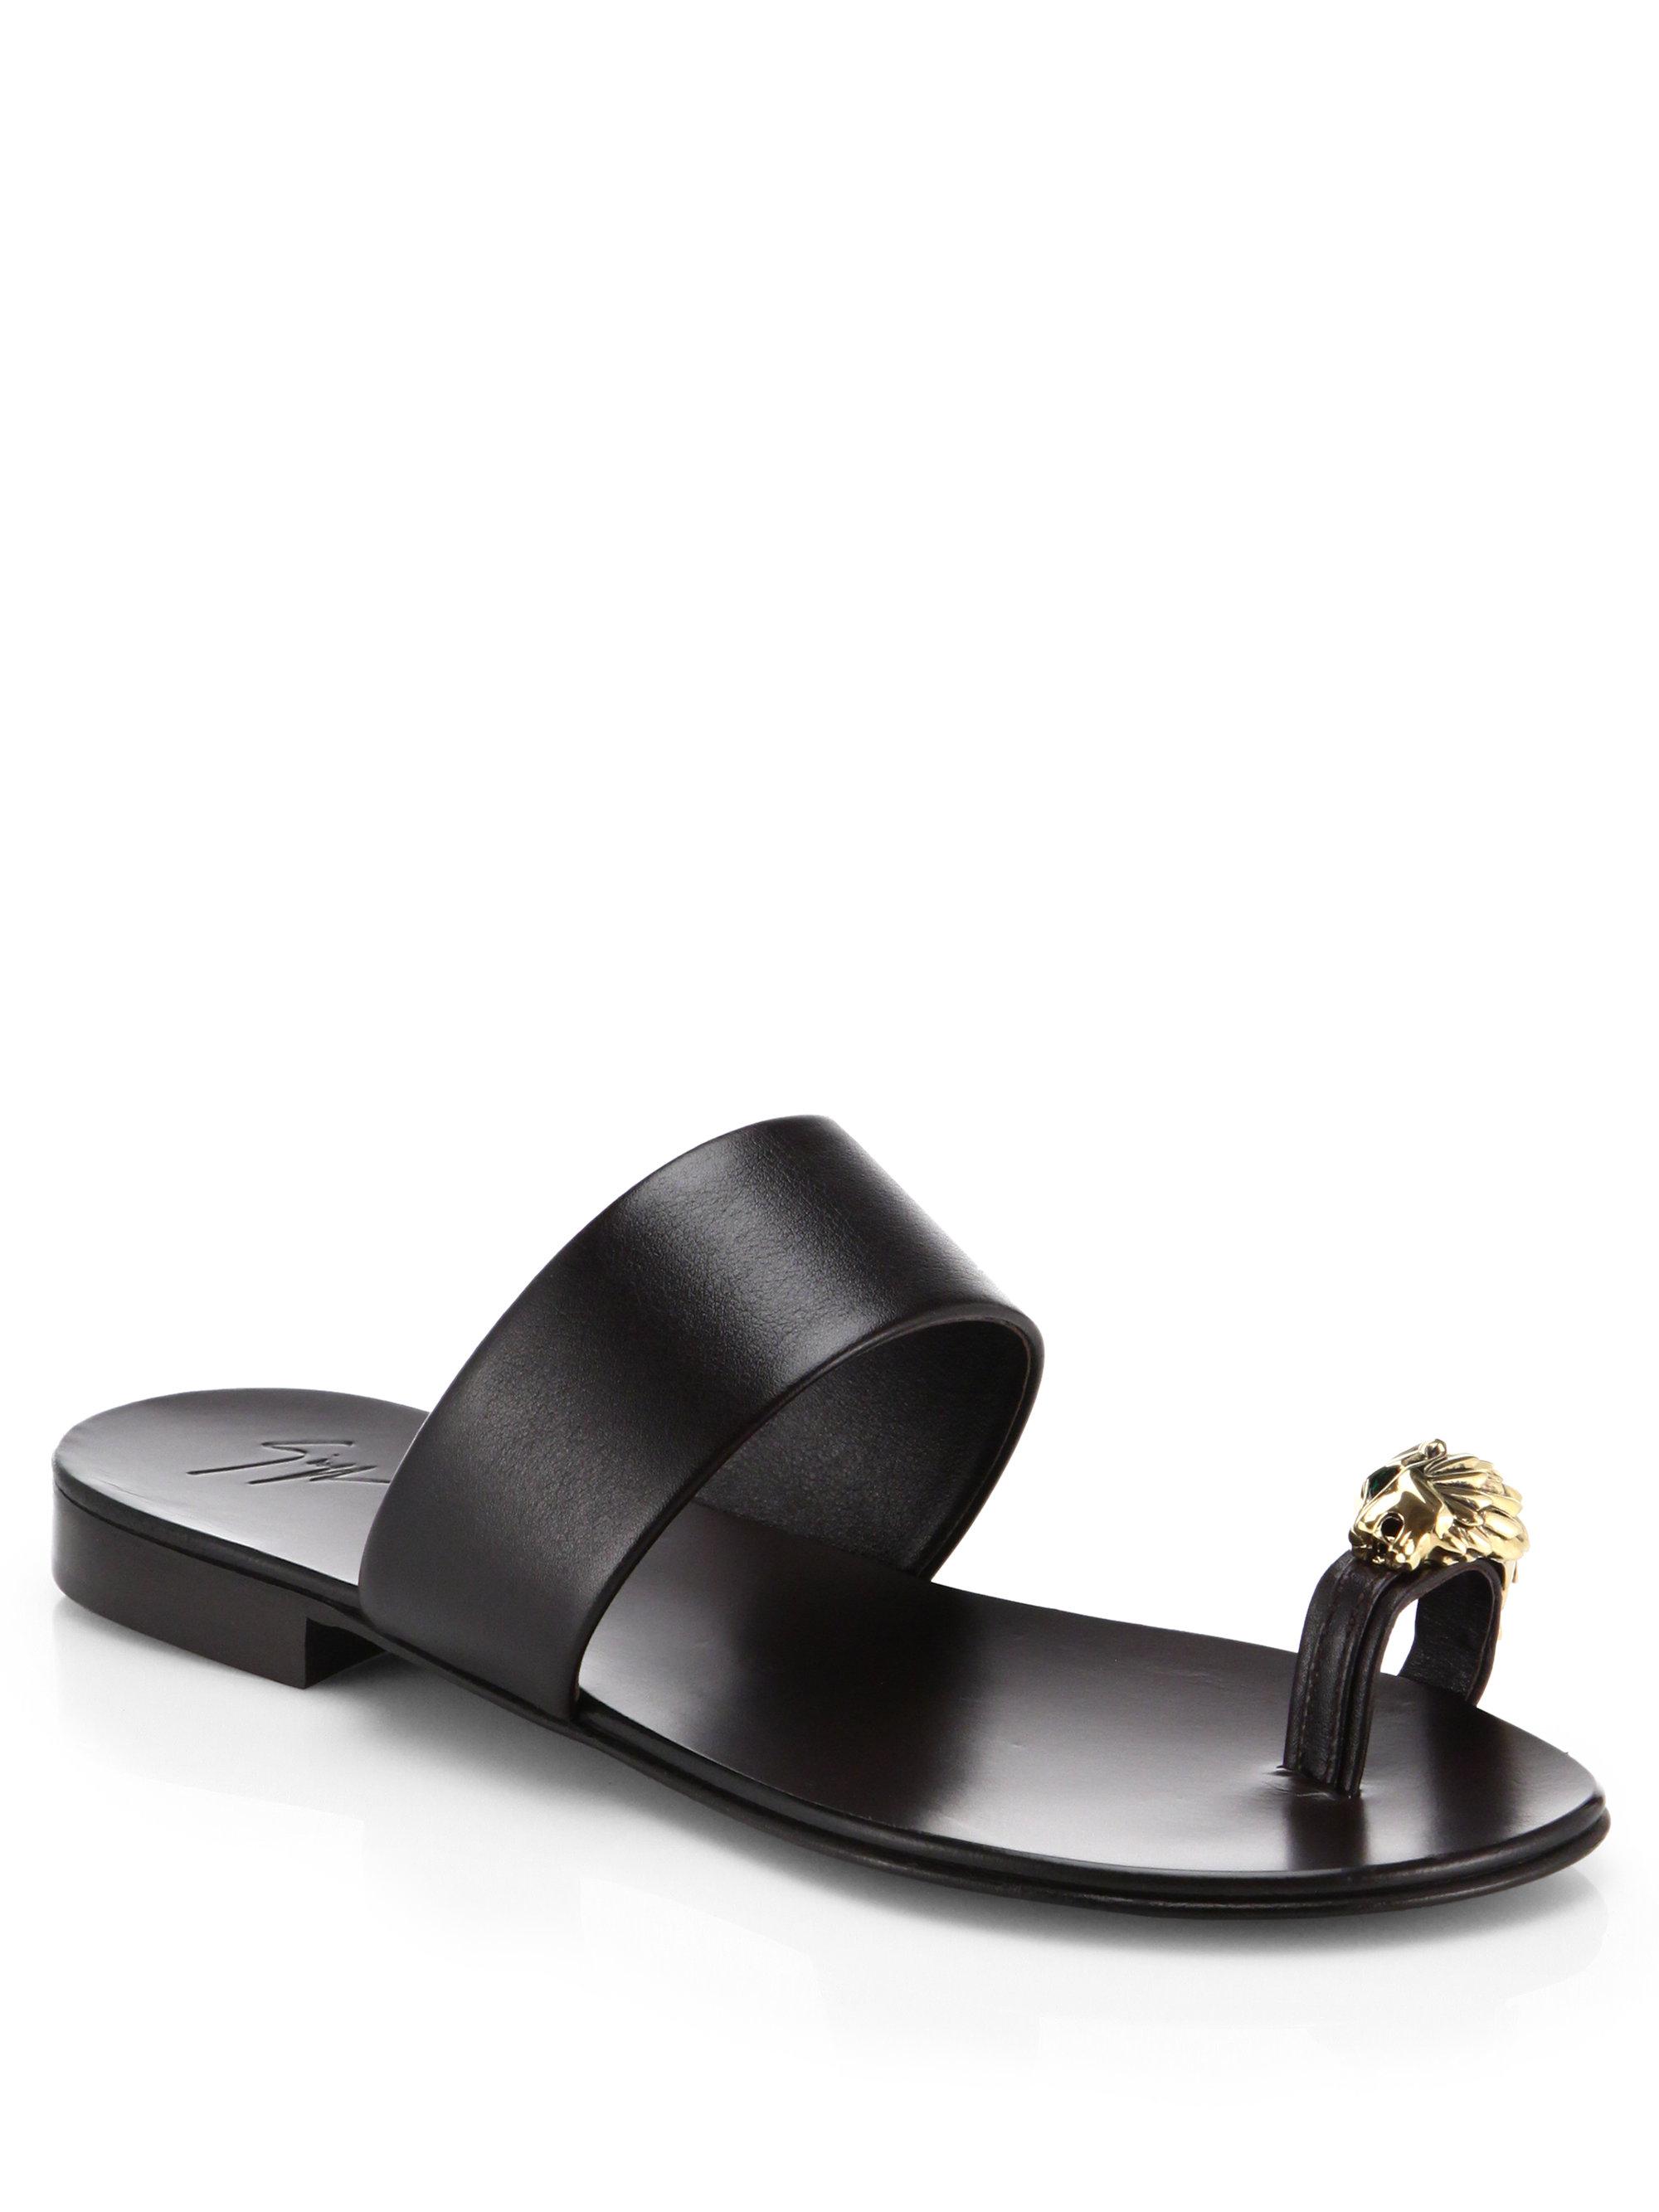 6a84982fc7775 Giuseppe Zanotti Metallic Lion Toe Ring Leather Sandals in Black - Lyst